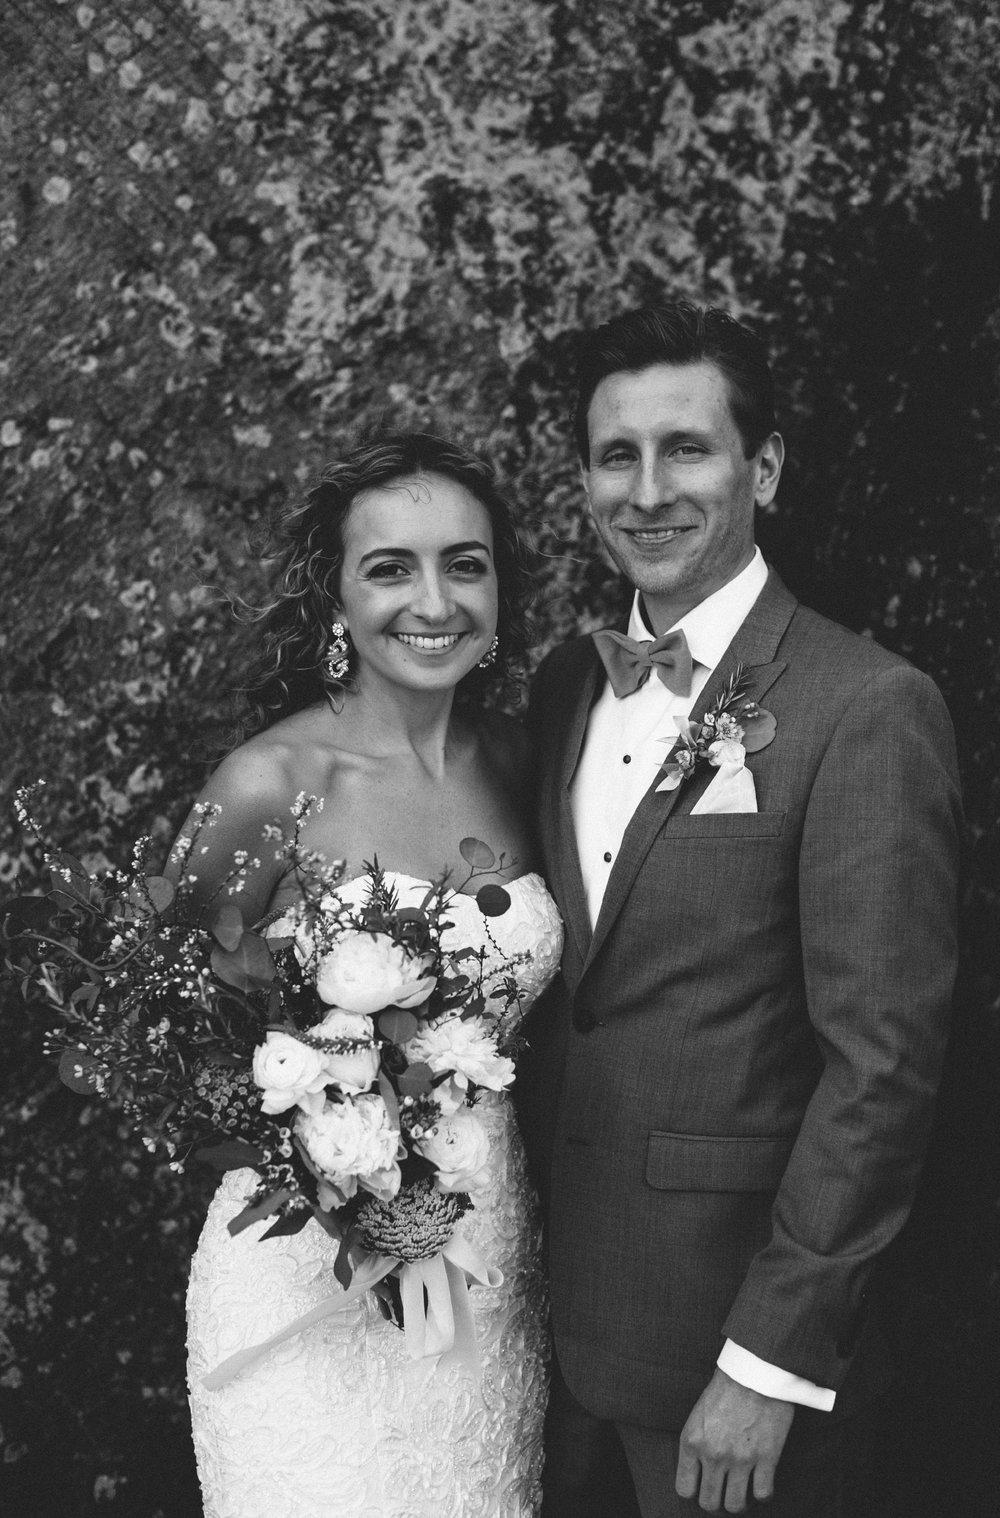 Briana + Bryan Wedding at the West Palm Beach Lake House 39.jpg